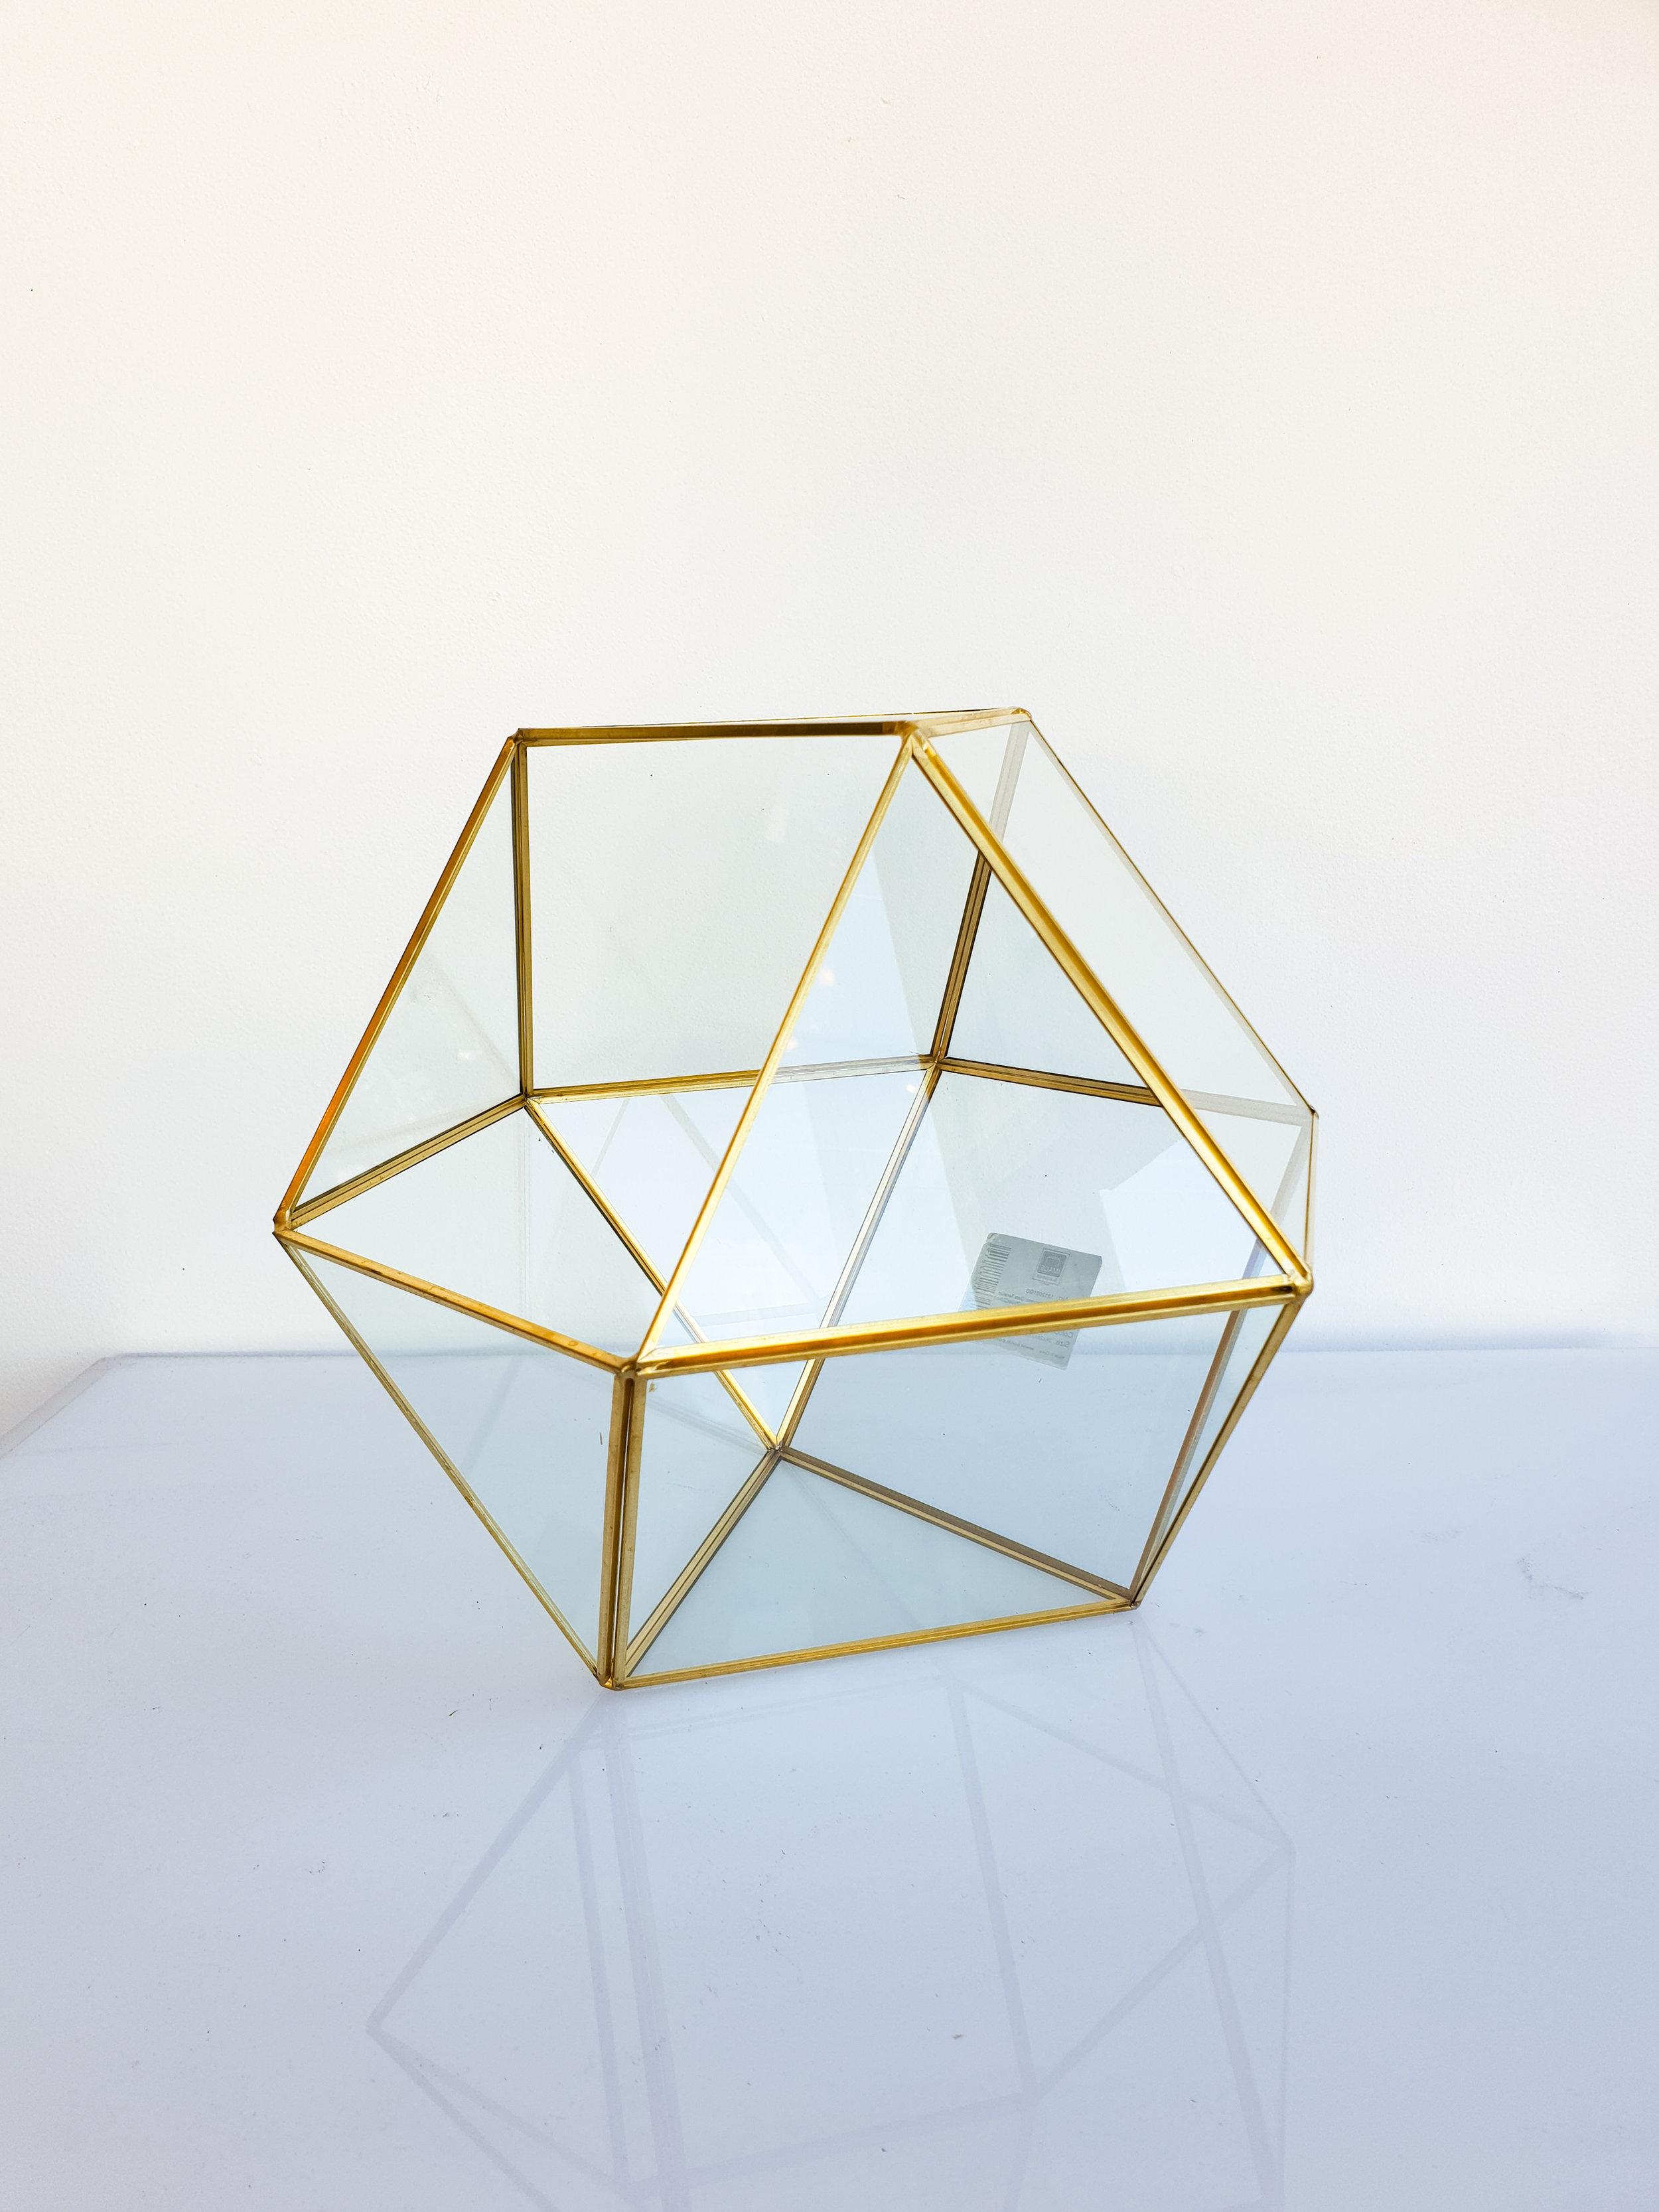 GOLD GEO GLASS TERRARIUM  $15+GST